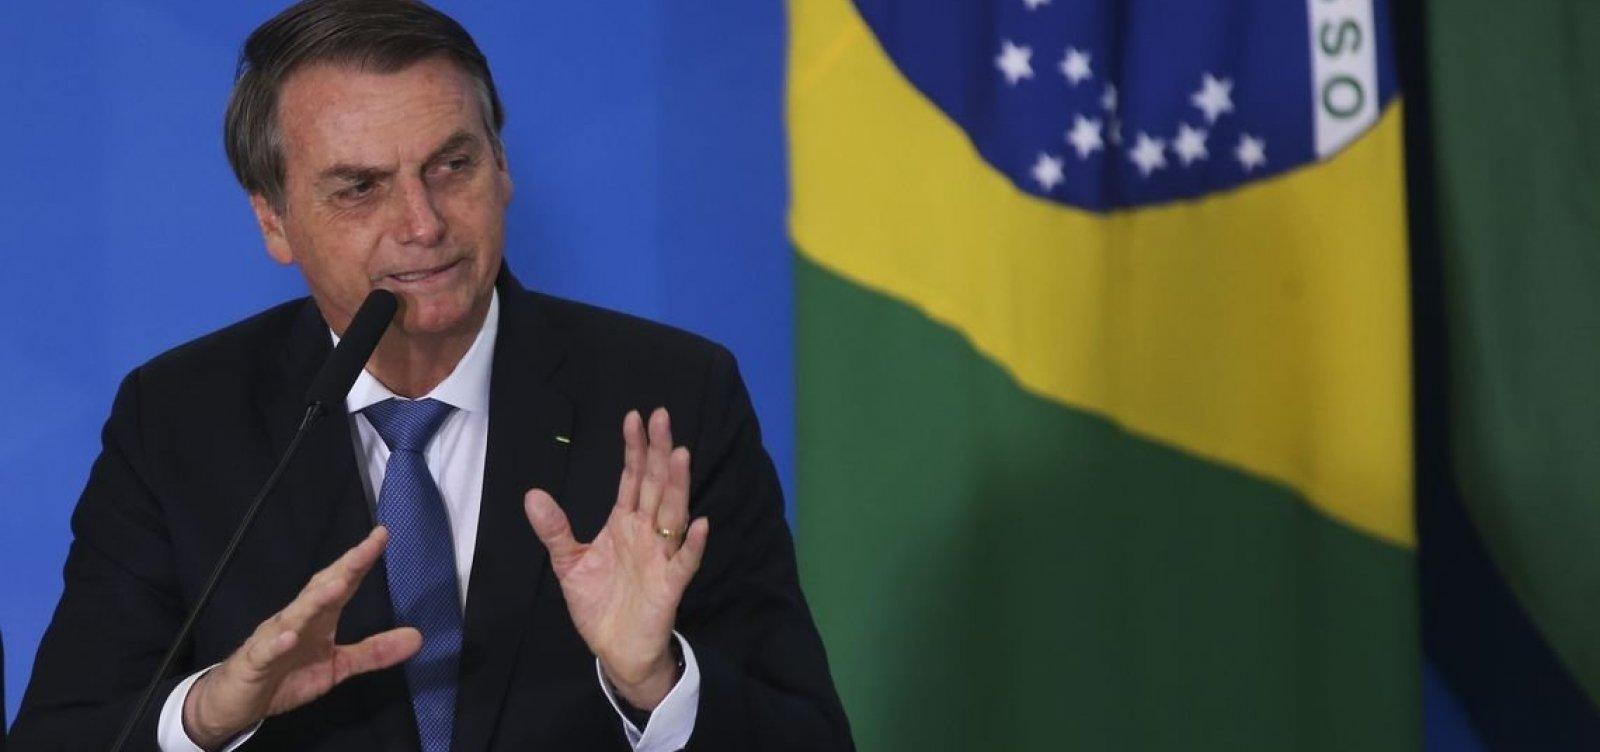 Congresso derruba veto de Bolsonaro sobre fundo eleitoral